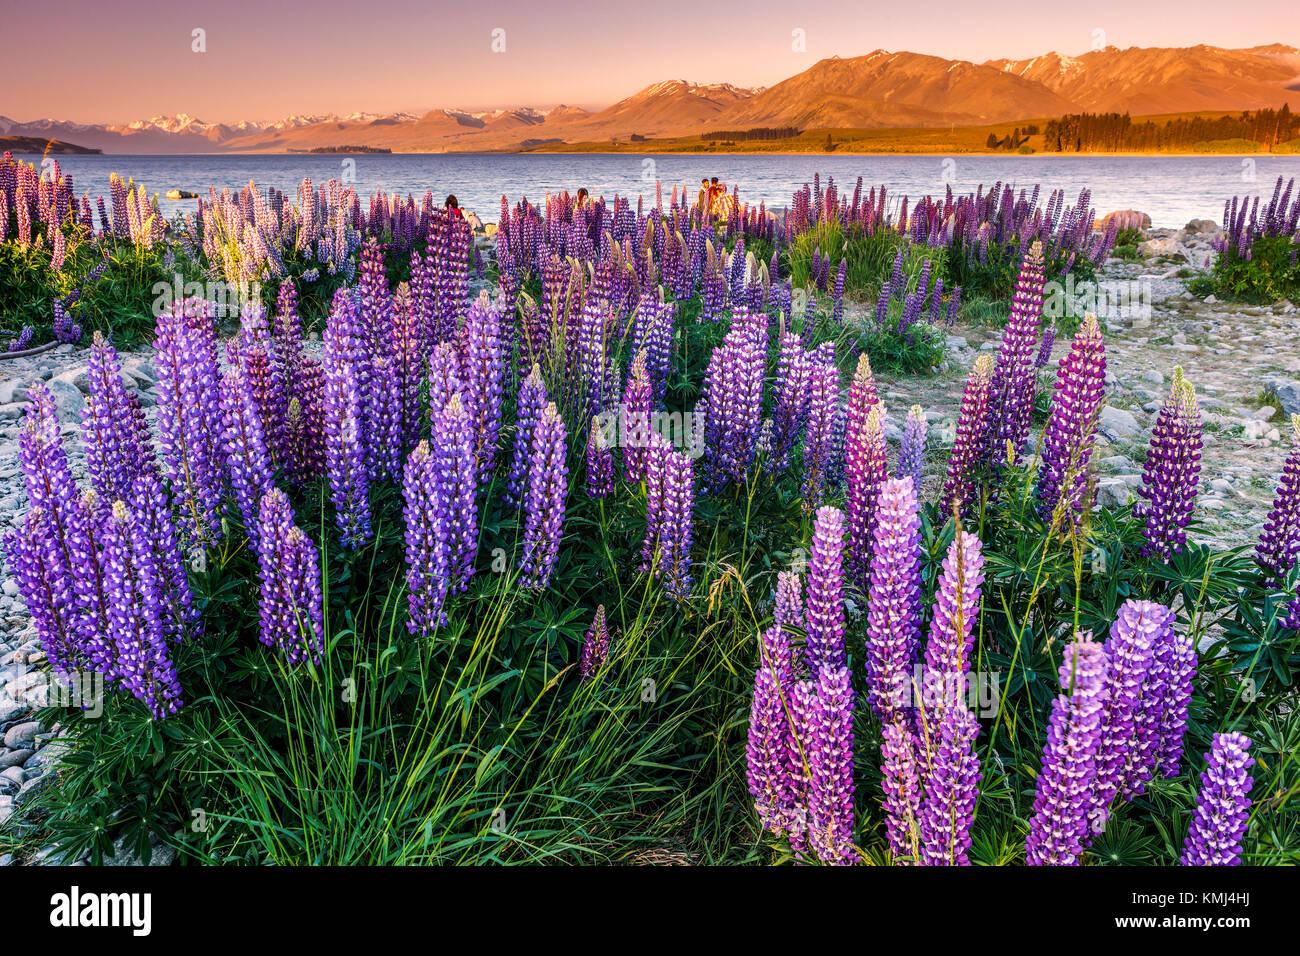 Lupins at Lake Tekapo, Mac Kenzie Country, New Zealand. - Stock Image